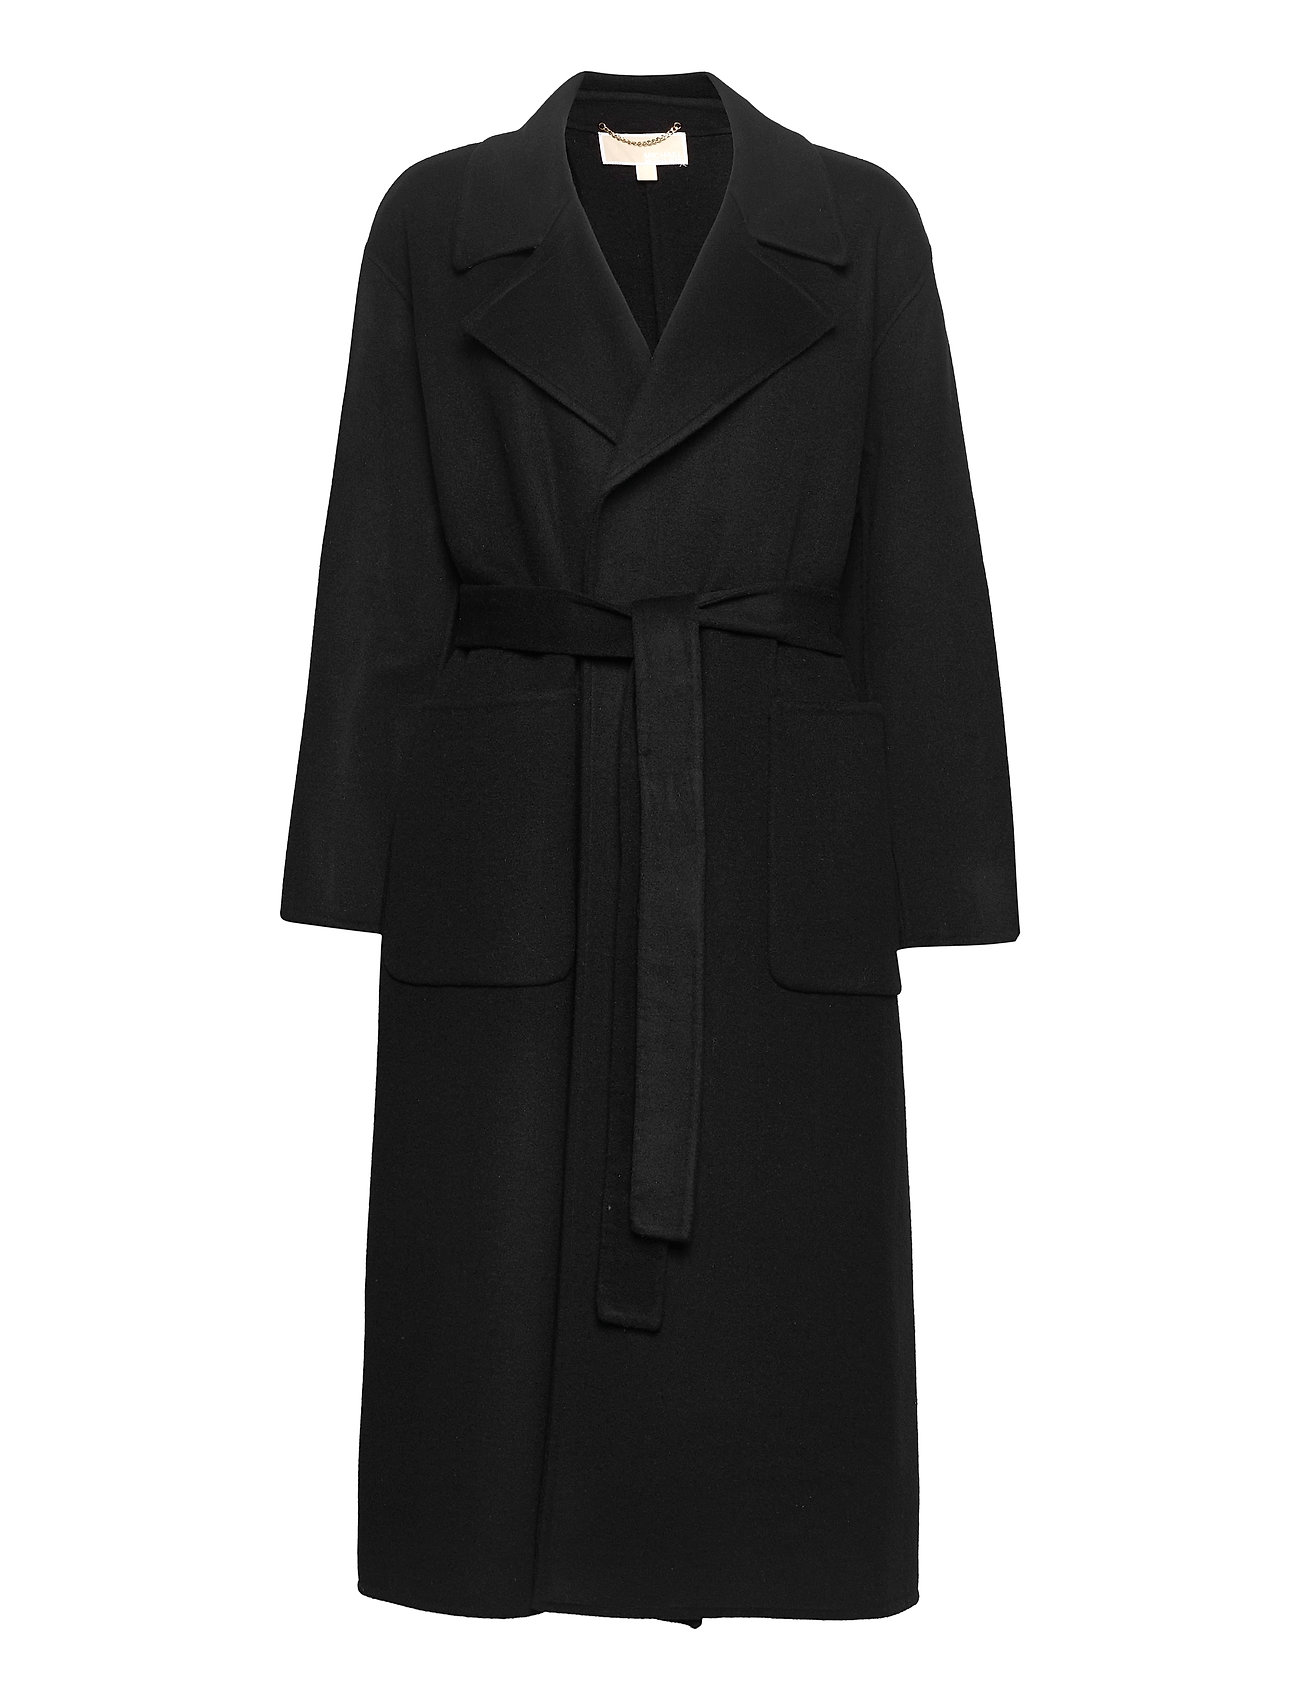 Dbl Face Robe Coat Uldfrakke Frakke Sort Michael Kors